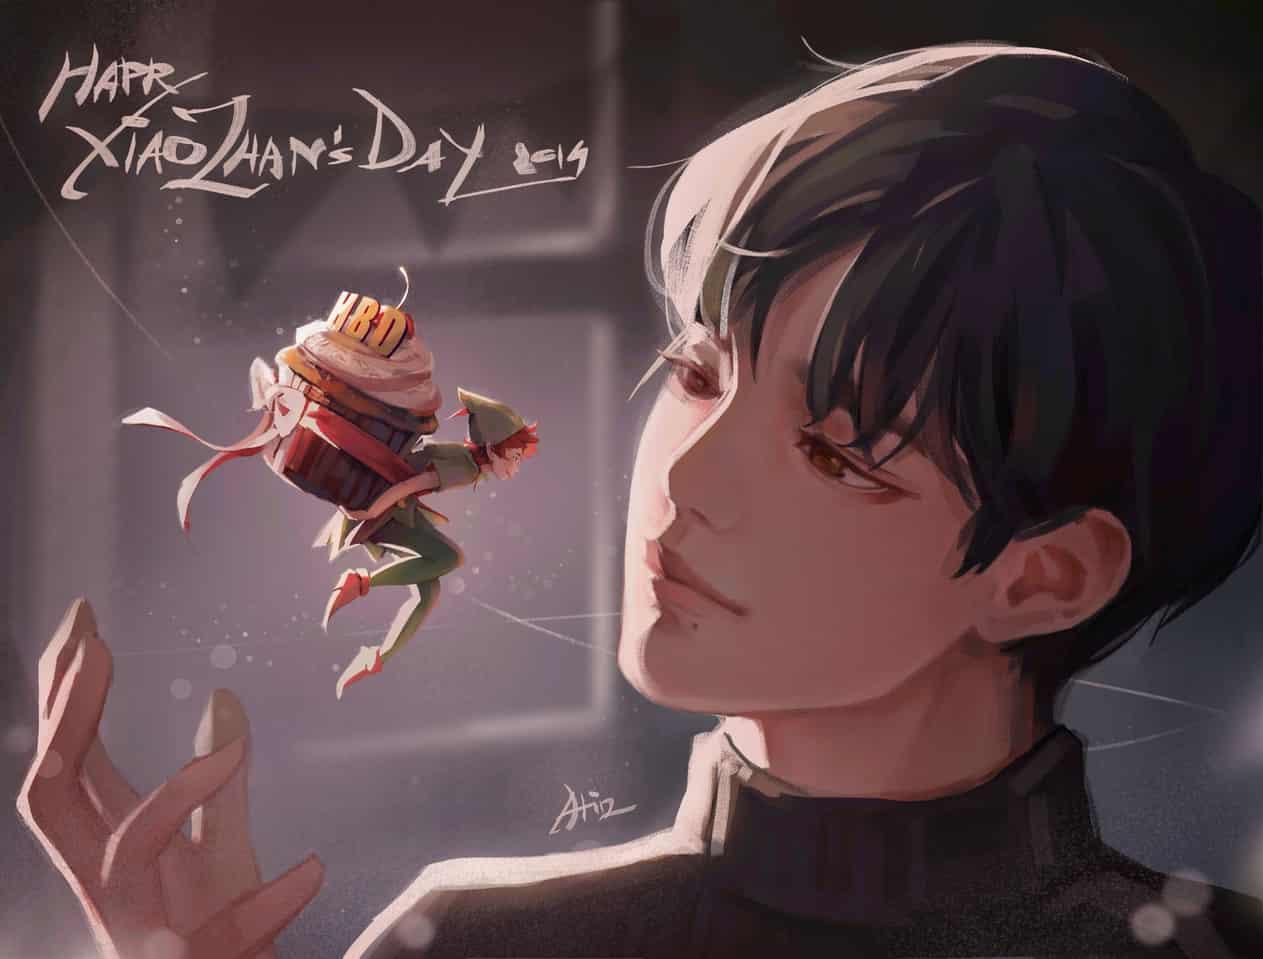 Happy Xiao Zhan's Day